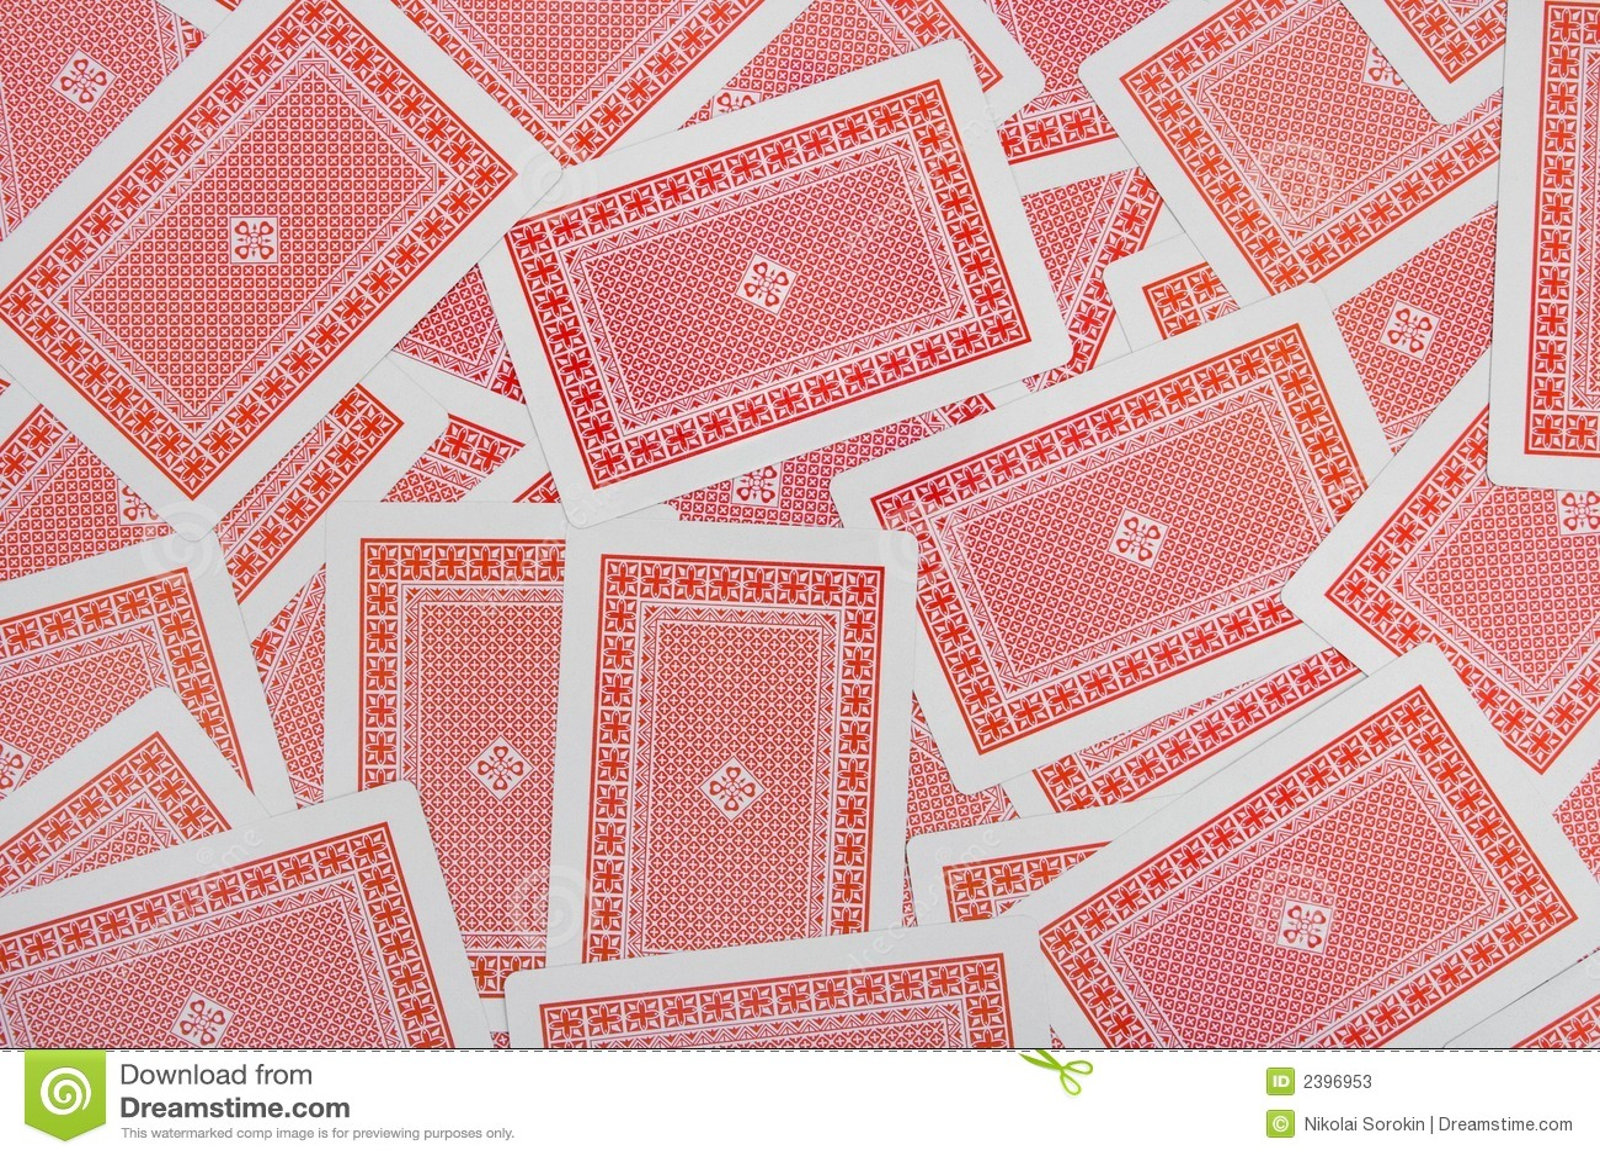 playing cards background stock image image of pile flush